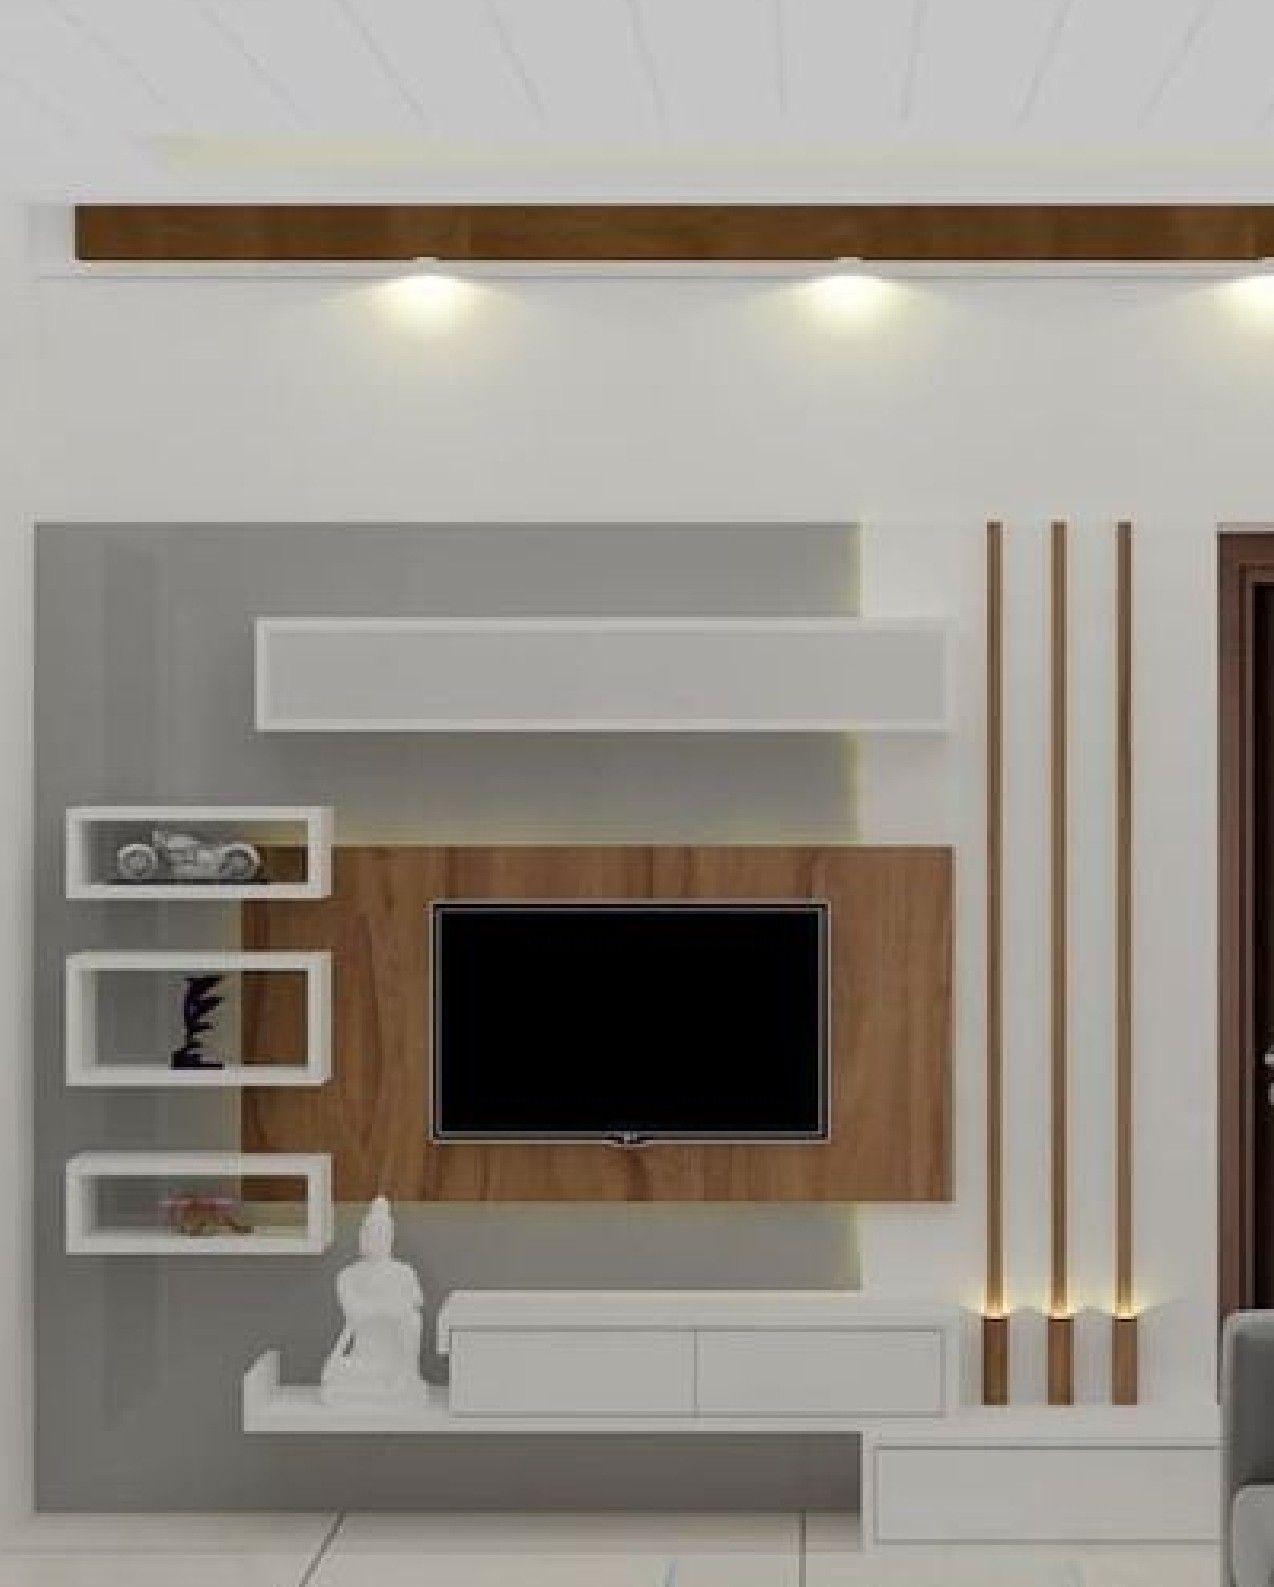 Pin By Premjeet Ramgarhia On Modern Tv Wall Units Wall Tv Unit Design Living Room Tv Unit Designs Tv Unit Interior Design